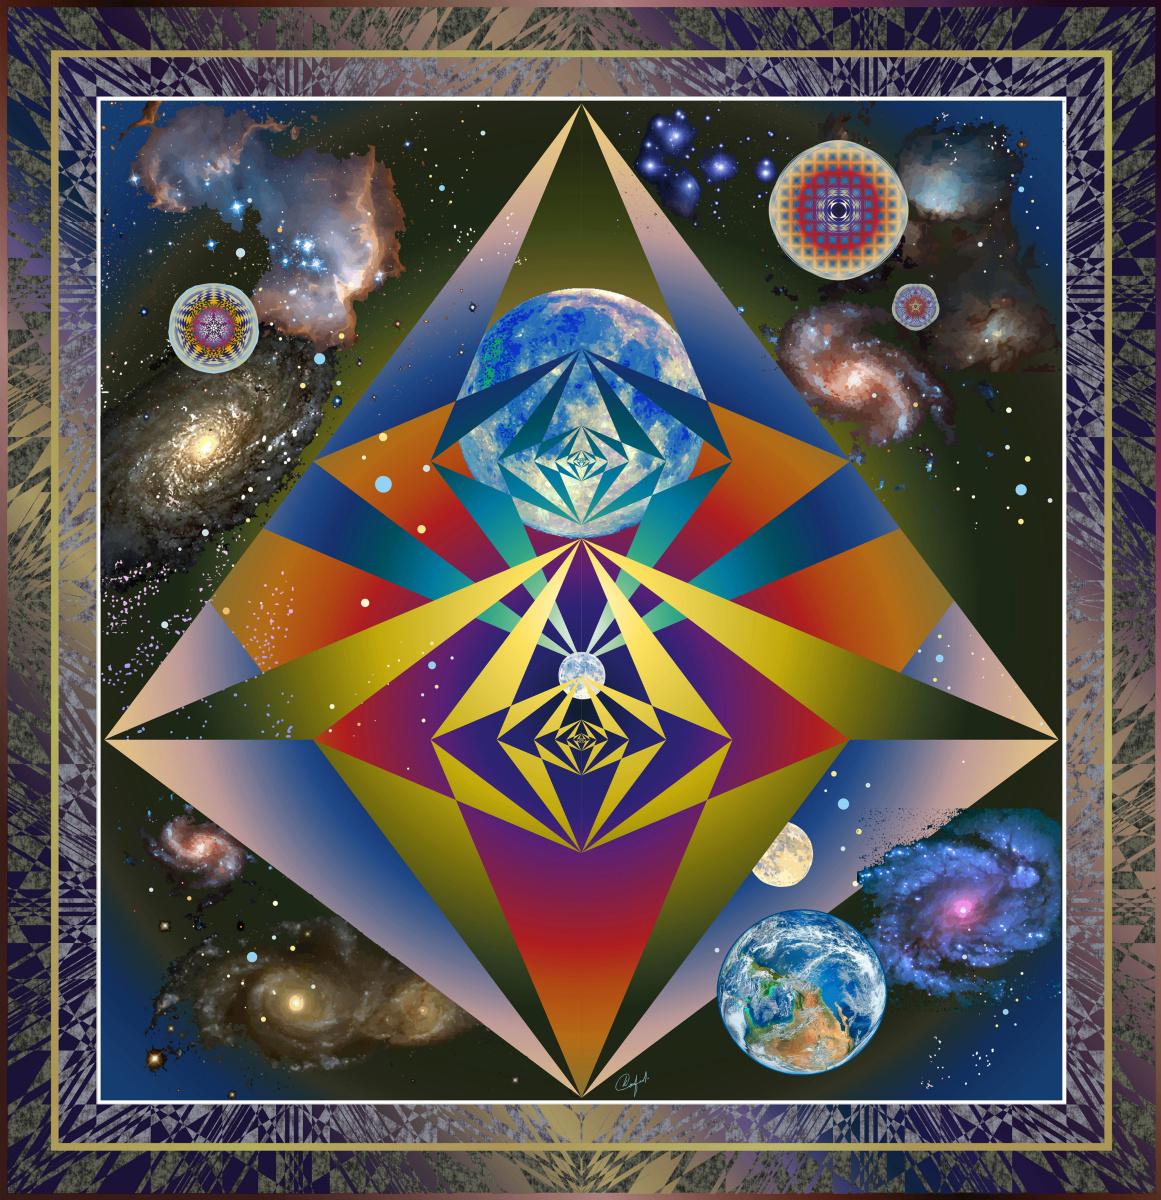 Юрий Николаевич Сафонов (Yury Safonov). «Space pyramids» - Dark energy